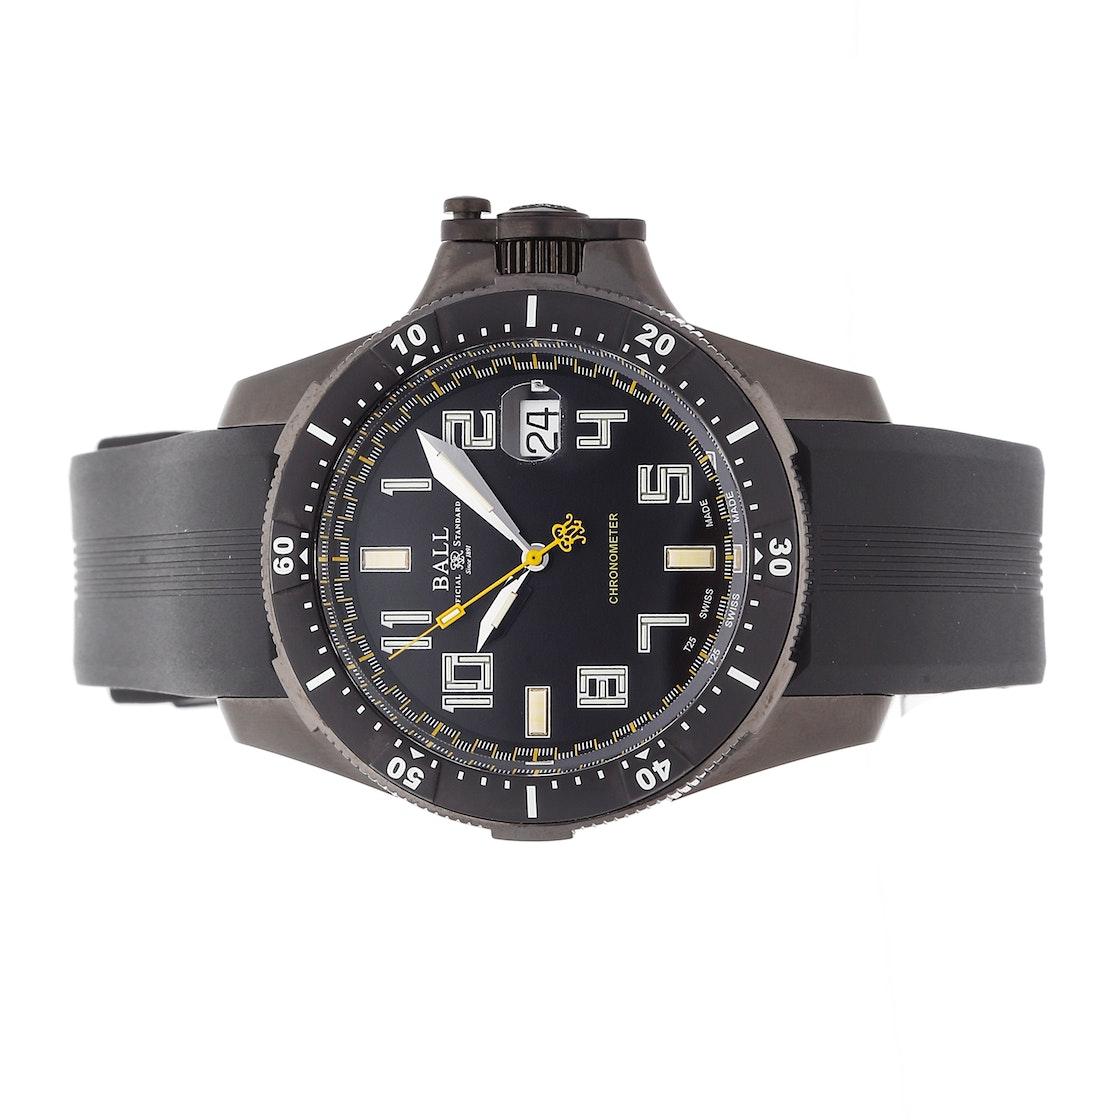 Ball Watch Company Engineer Hydrocarbon DM2176A-P1CAJ-BK